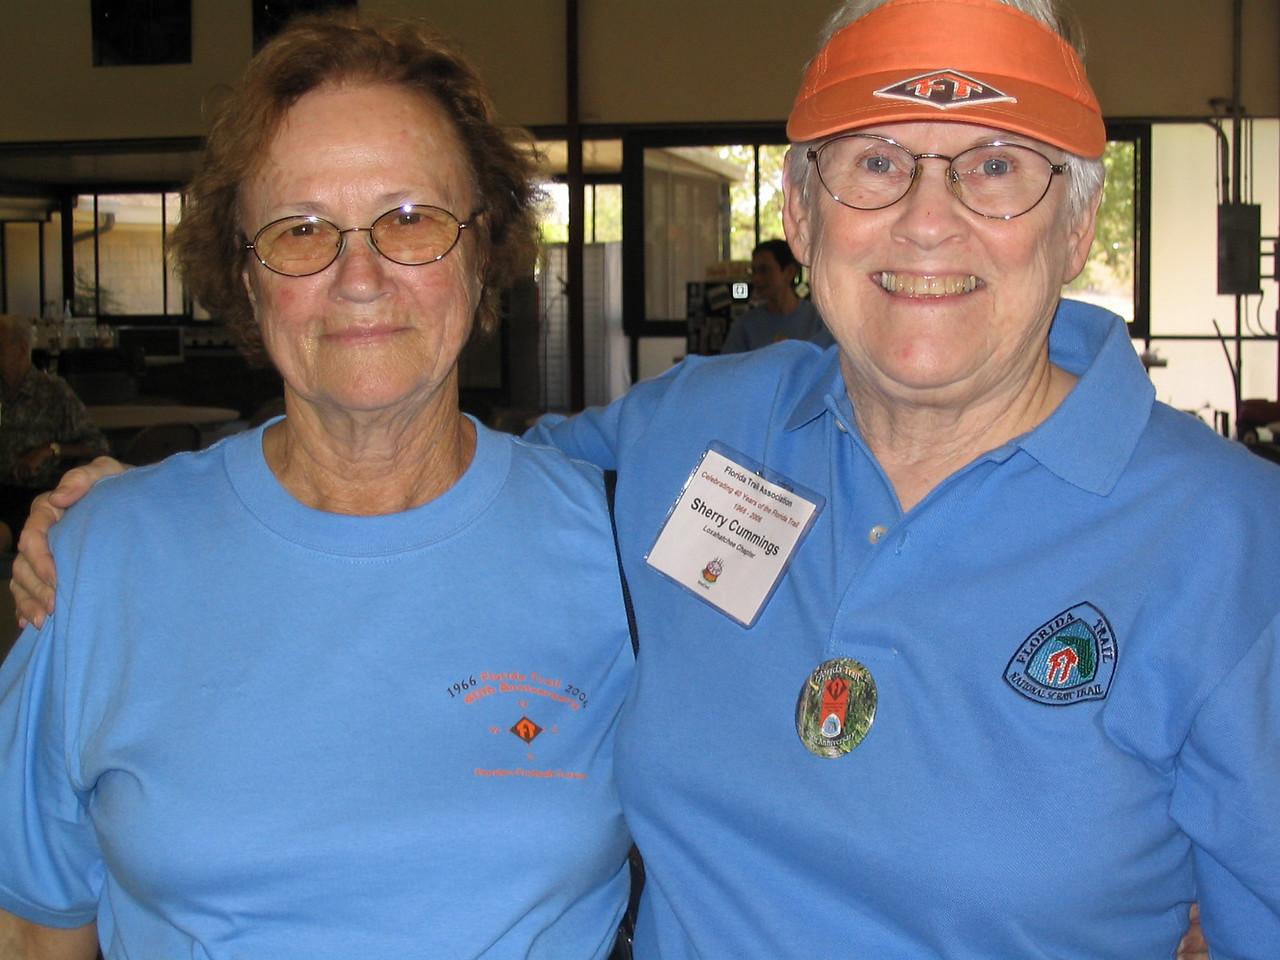 Best buddies Daisy Palmer and Sherry Cummings<br /> PHOTO CREDIT: Diane Wilkins / Florida Trail Association